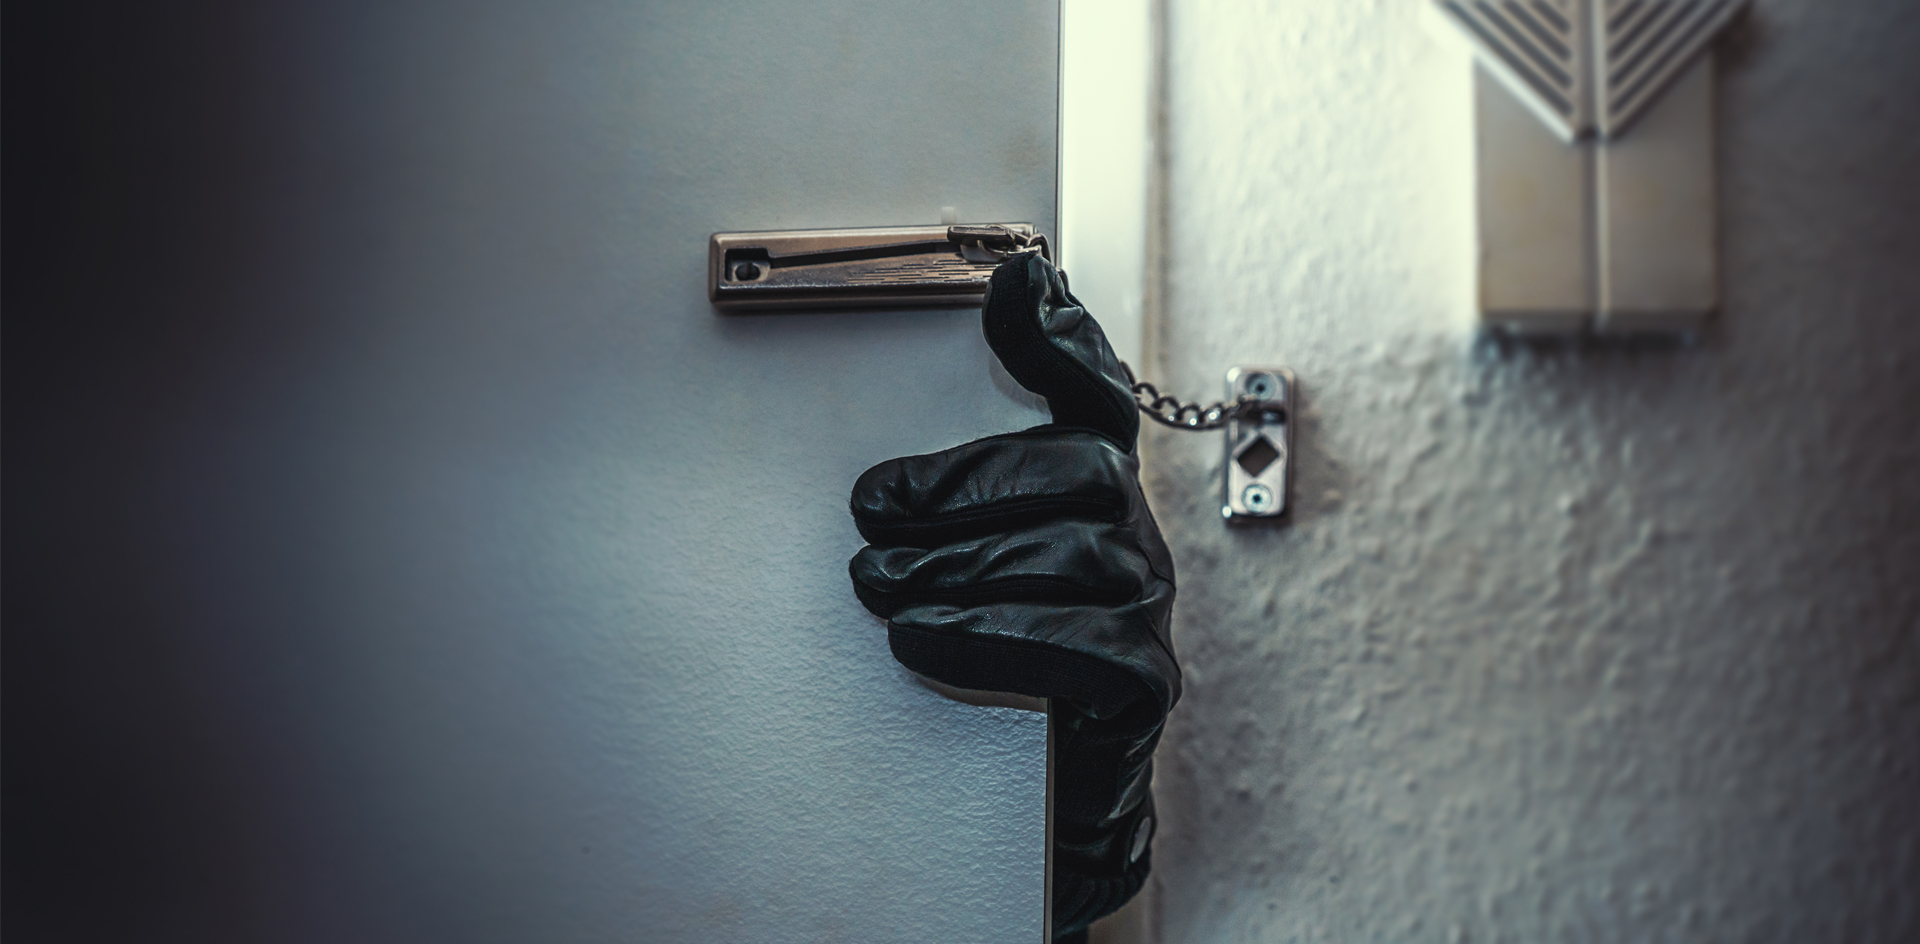 Невирусная угроза: как россияне нарушают закон во время карантина